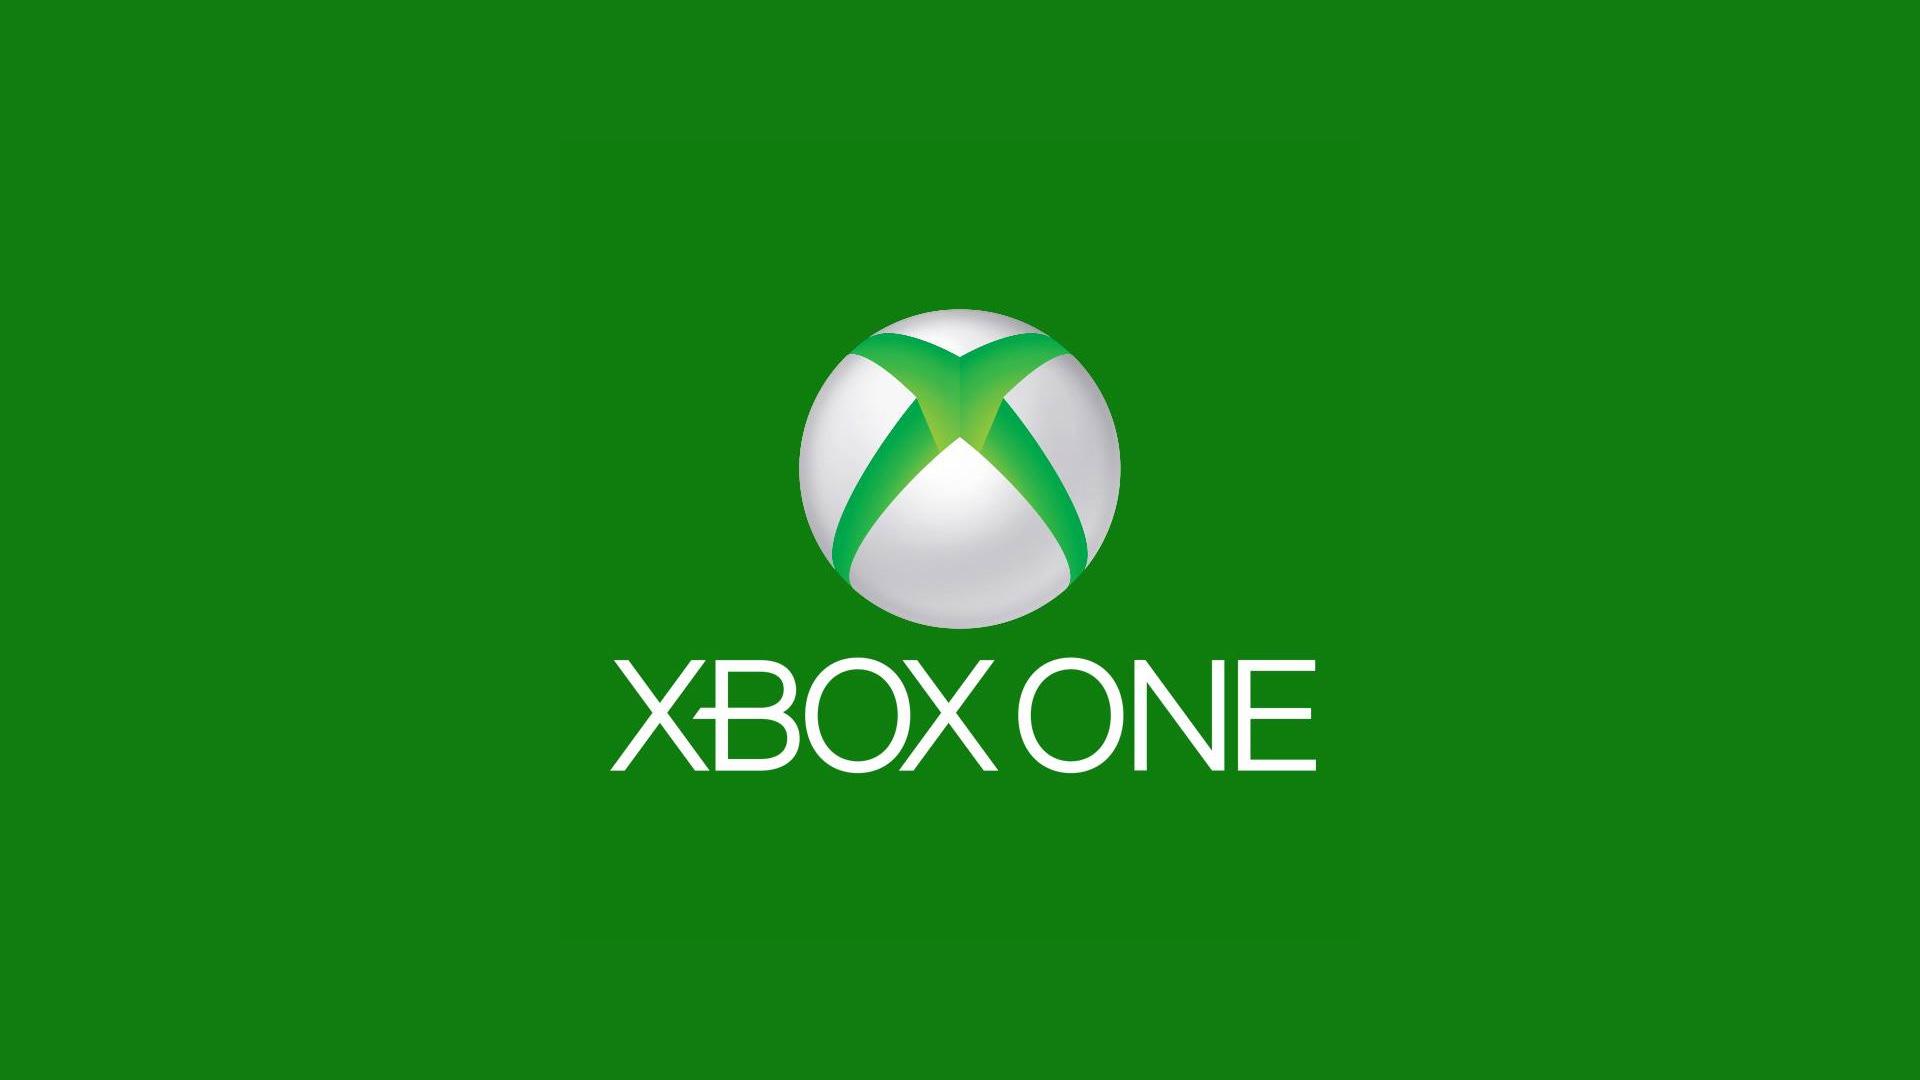 Xbox One Logo 1080p Wallpaper Xbox One Logo 720p Wallpaper 1920x1080